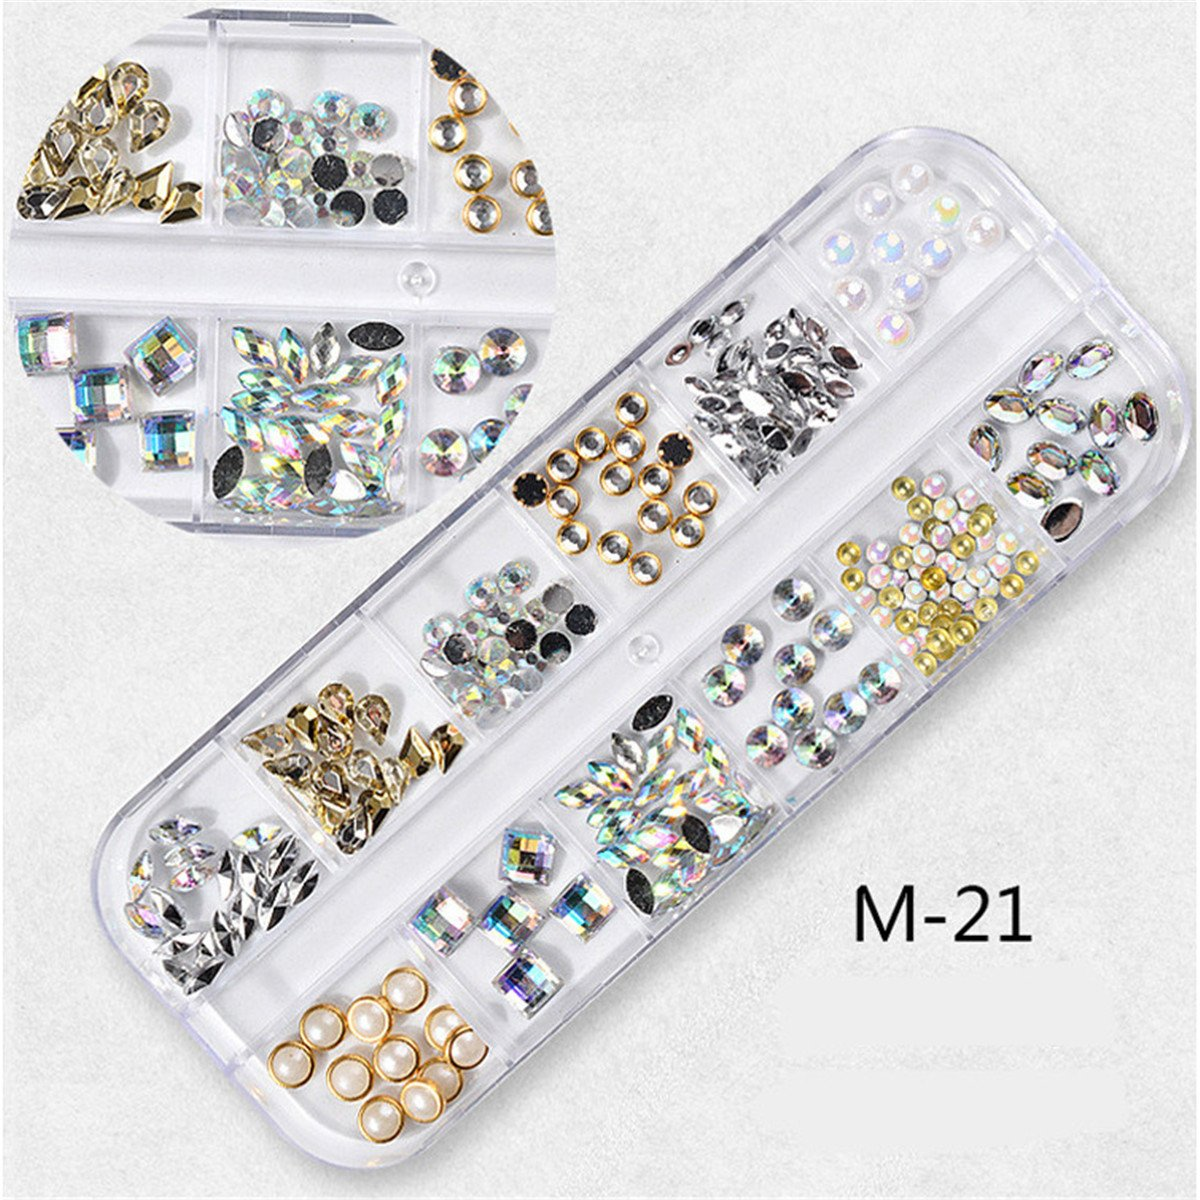 Mezerdoo 1 Set Shinny Bead Metal Pearls Crystal DIY Nail Art Rhinestones 3D Bead Stone Flat Decoration Shining Diamond Rhinestone Diy Tools